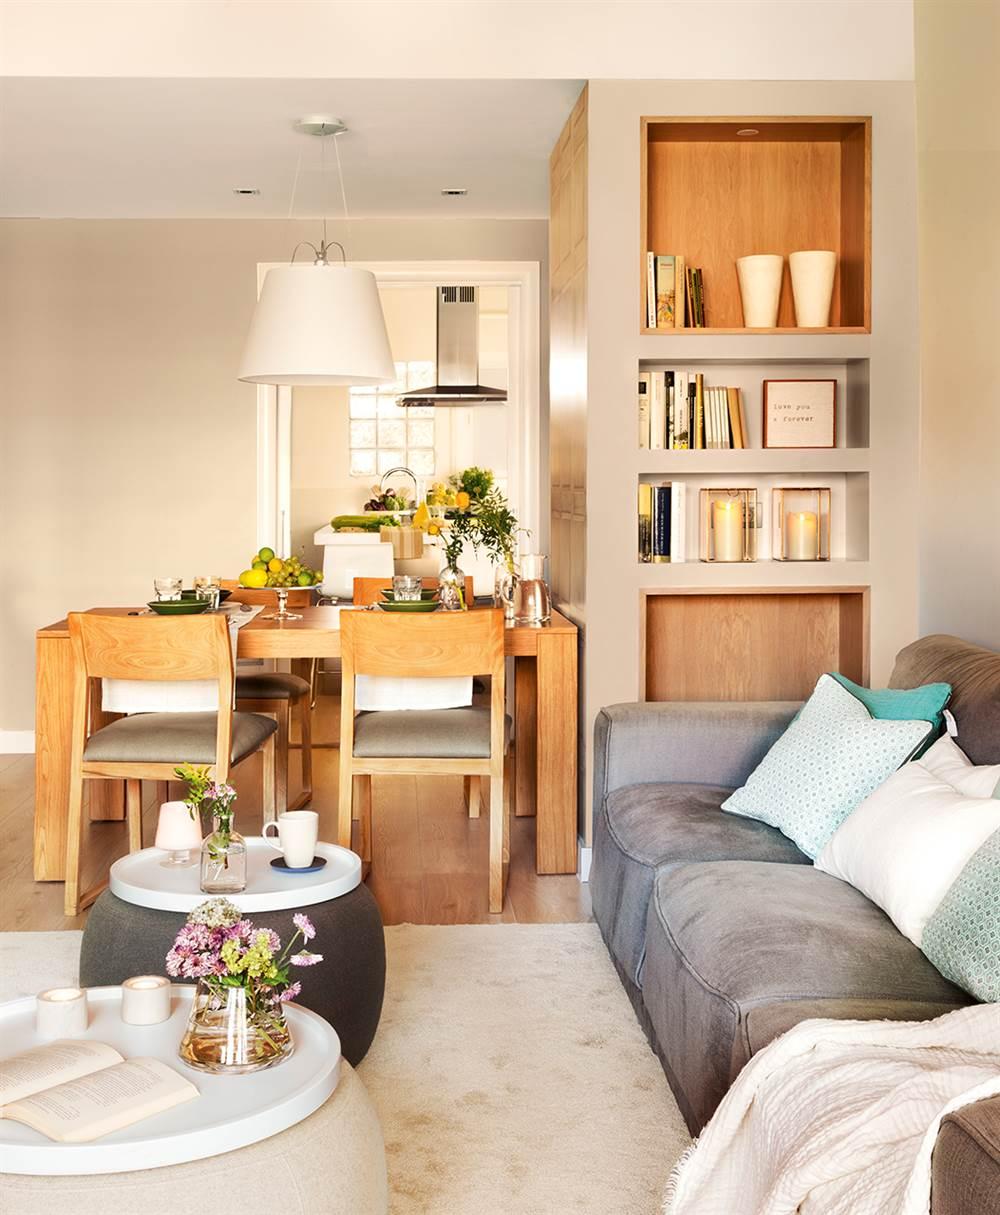 adelaparvu.com despre apartament 75 mp in tonuri deschise, designer Pia Capdevila, Foto Fernando Bedon, ElMueble (11)